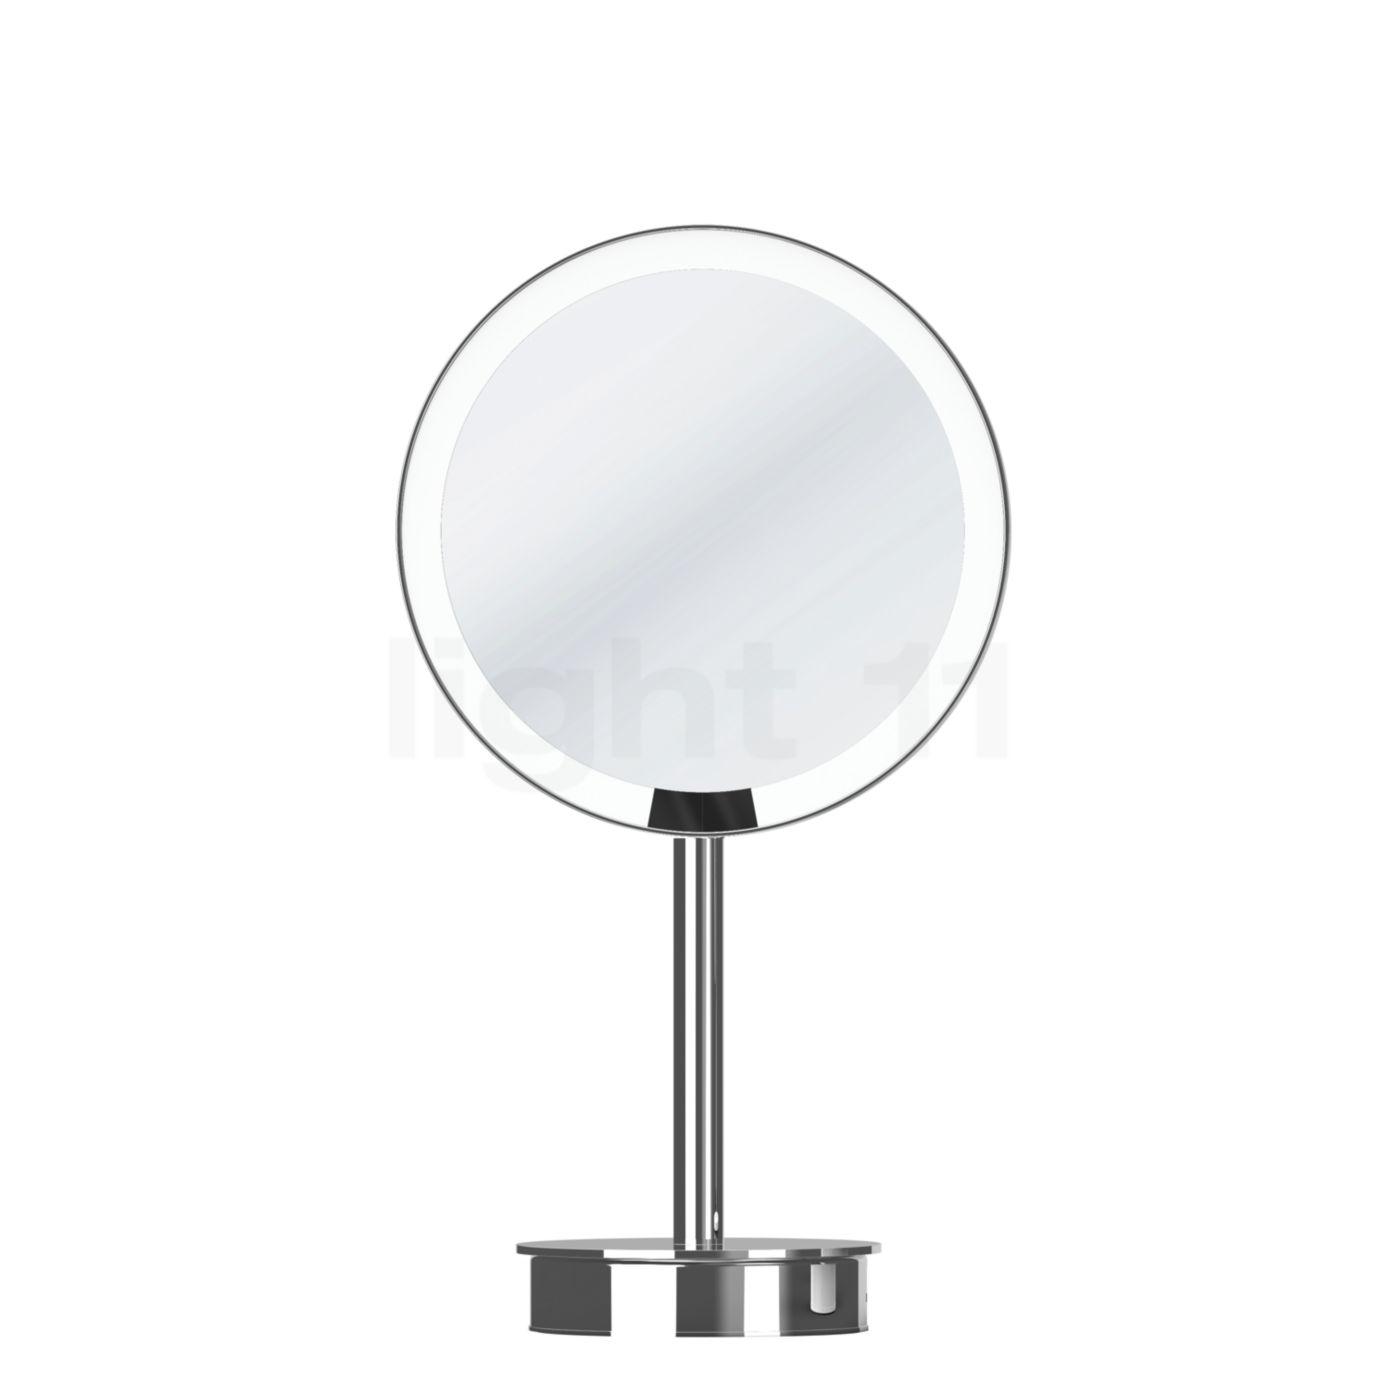 Just À Led Miroir Decor Poser Look Lumineux Walther De Maquillage hQrxtdsCBo